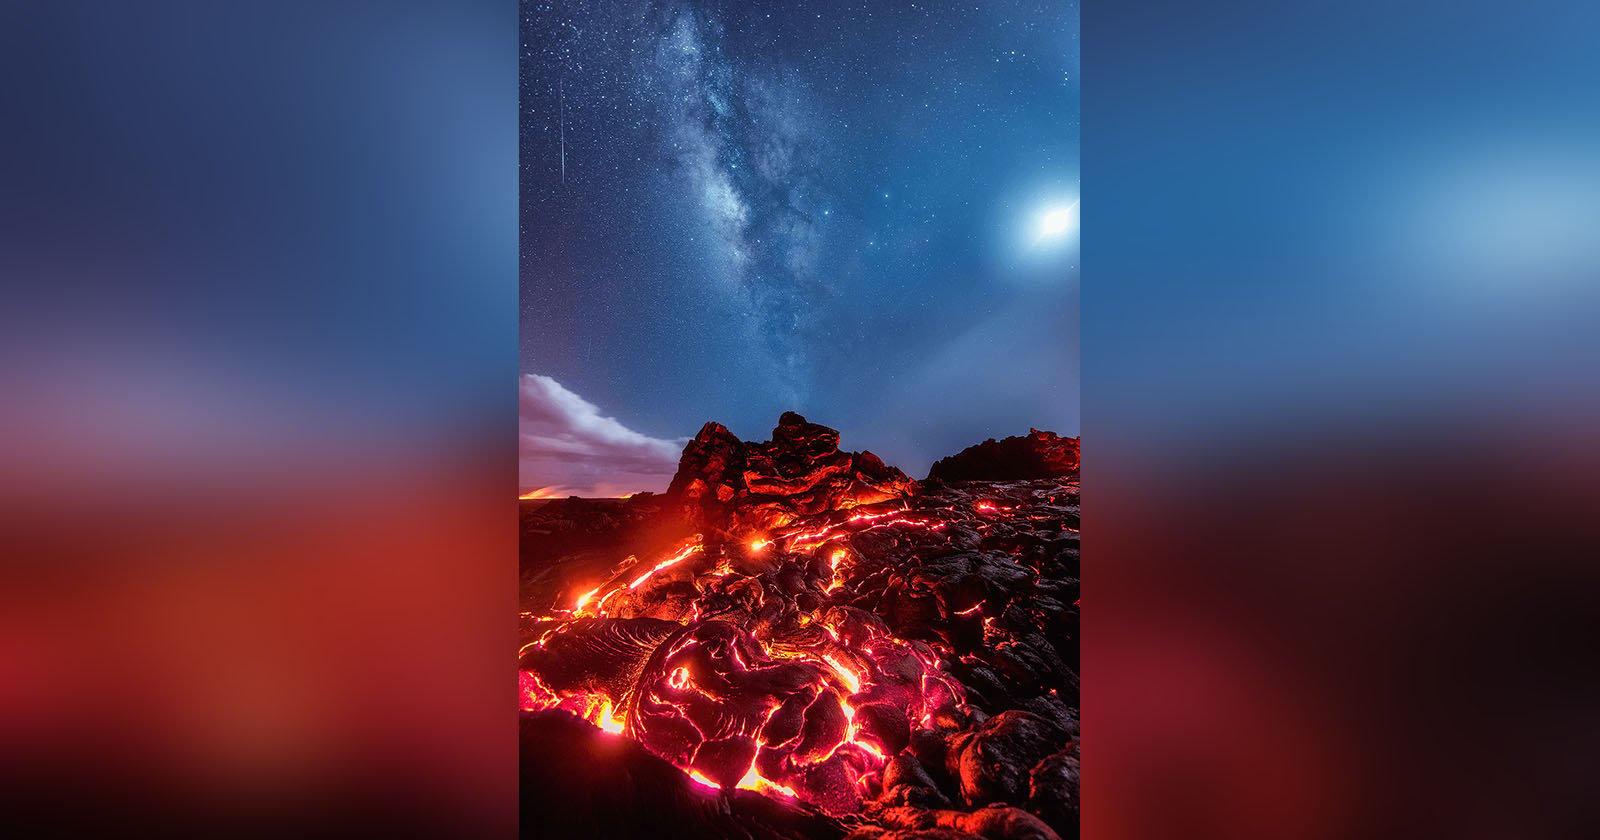 No, I Didn't Fake This Lava Photo